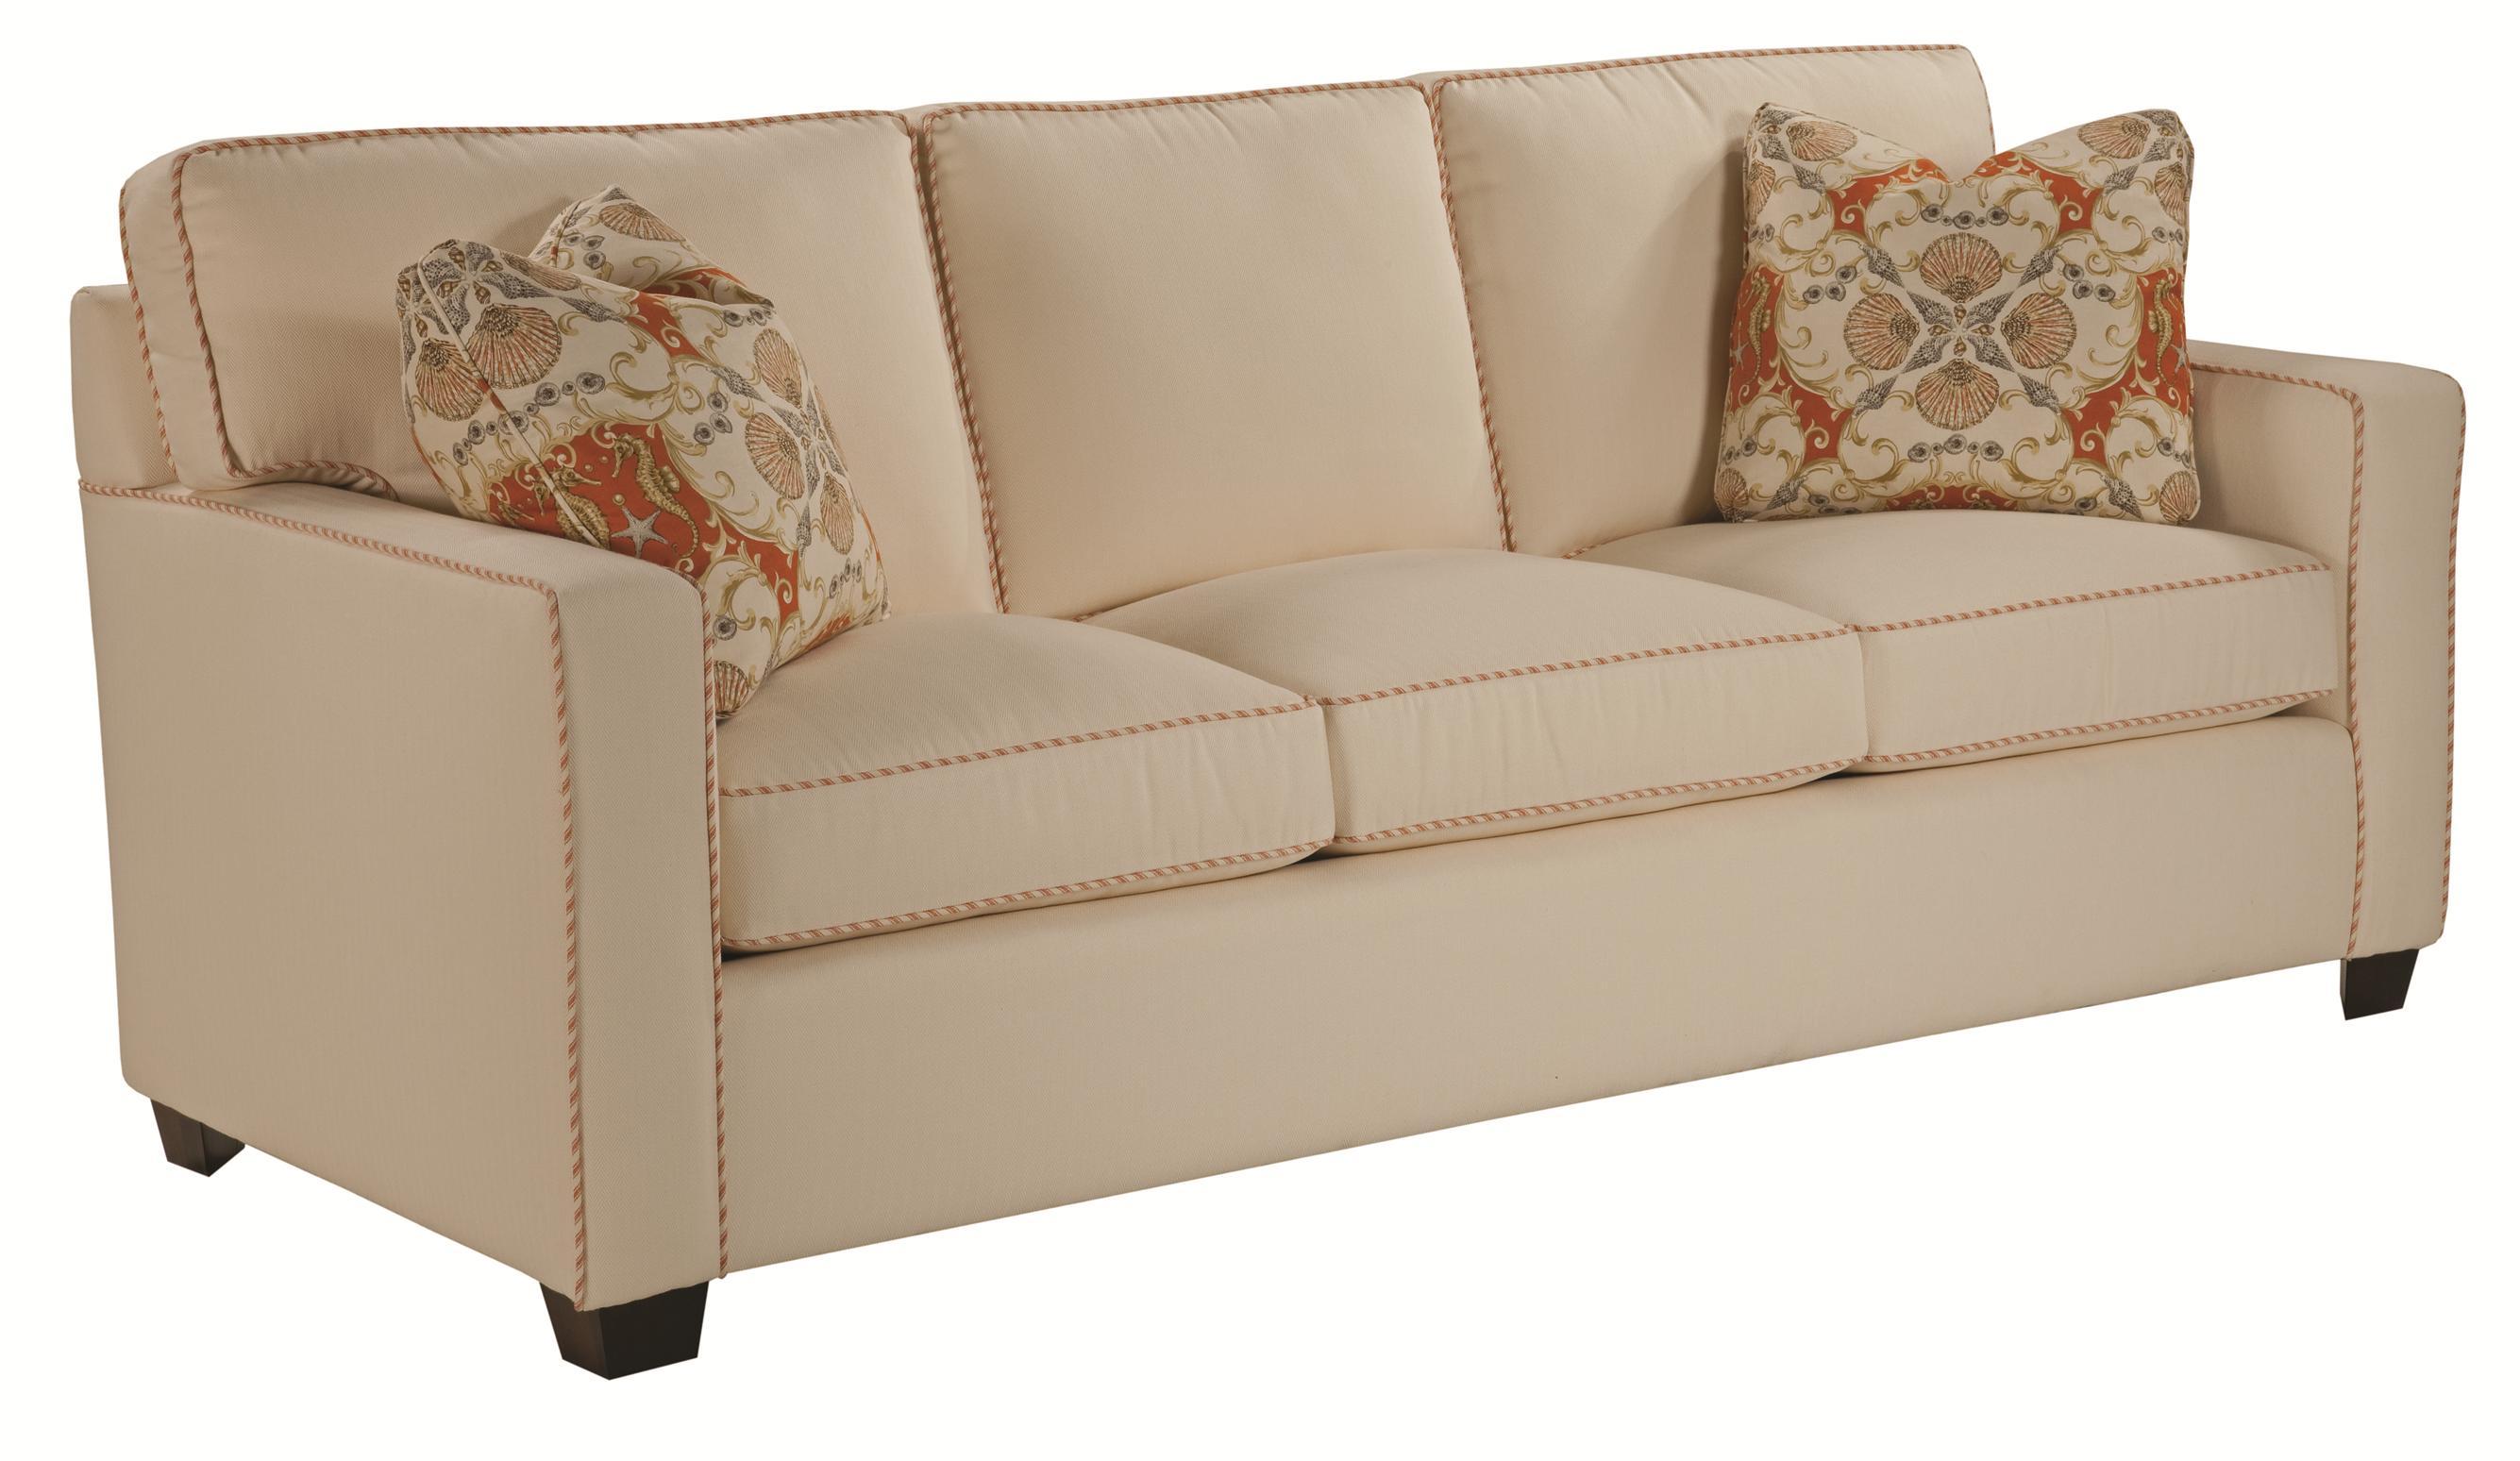 Brooke Stationary Sofa by Kincaid Furniture at Johnny Janosik